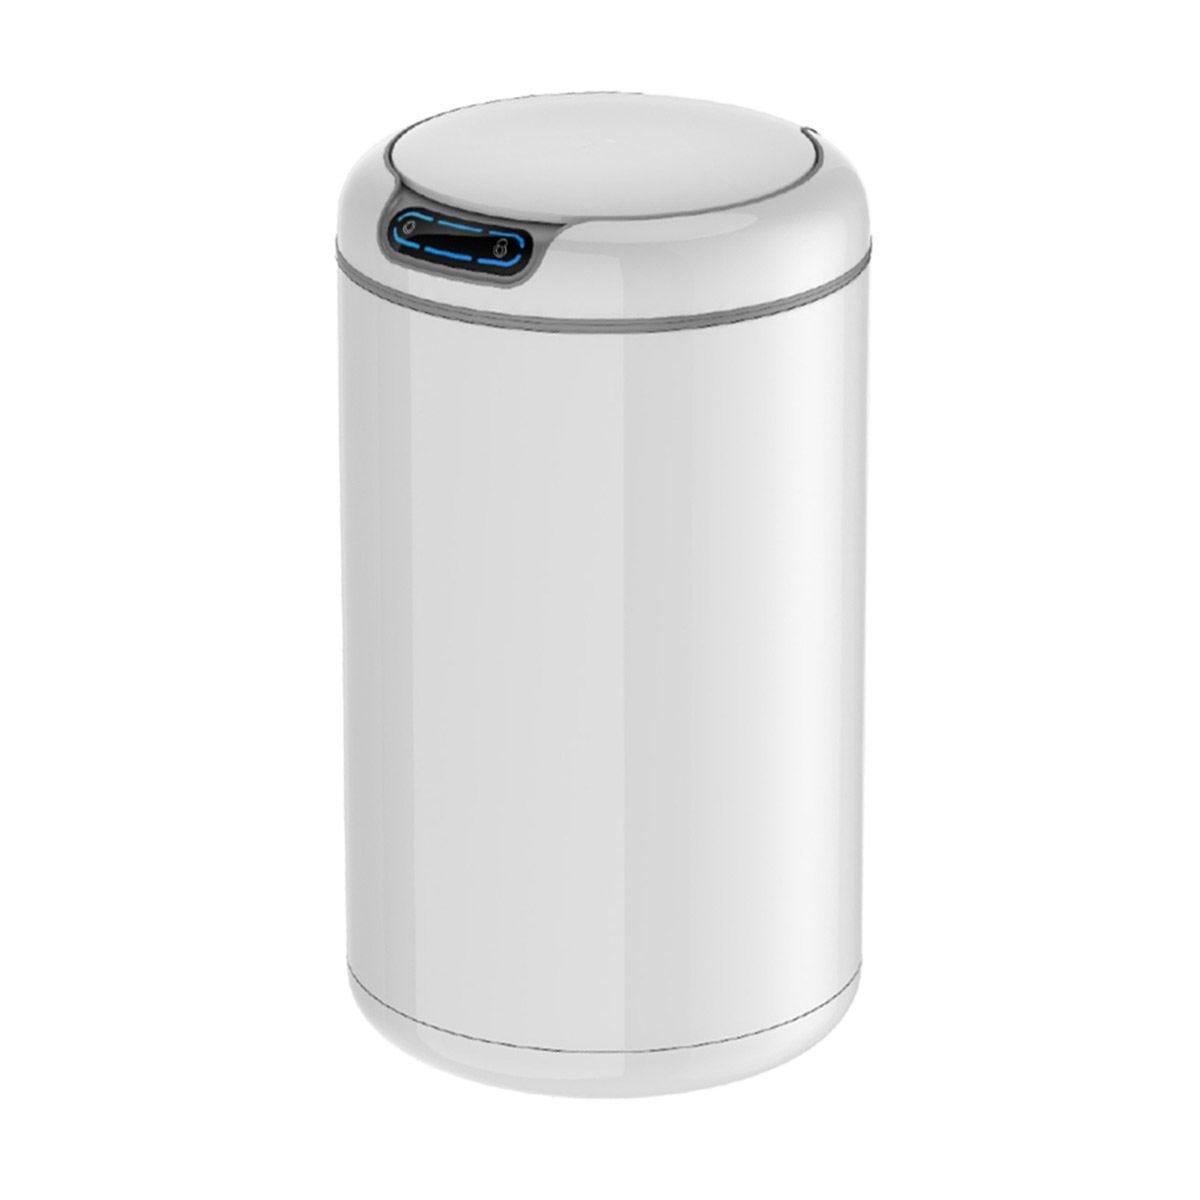 EKO Galleria 9L Sensor Bin - White